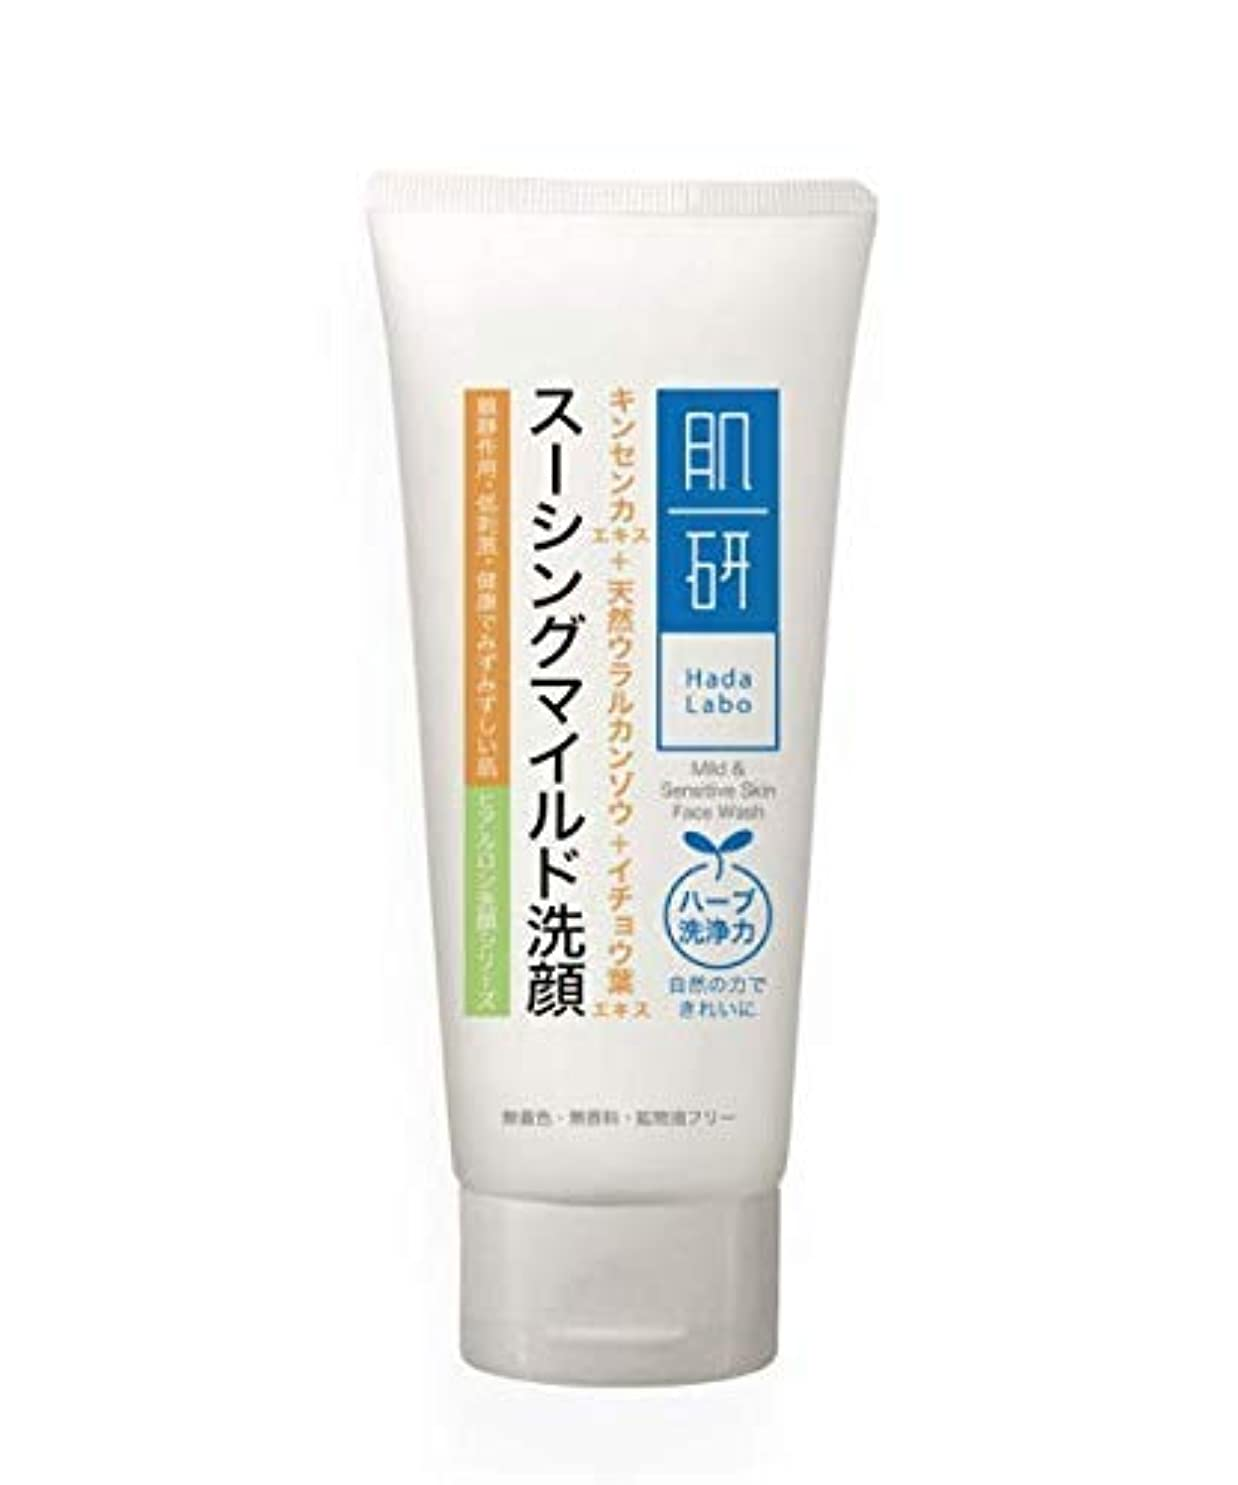 HADA LABO 100グラムマイルド洗顔&敏感